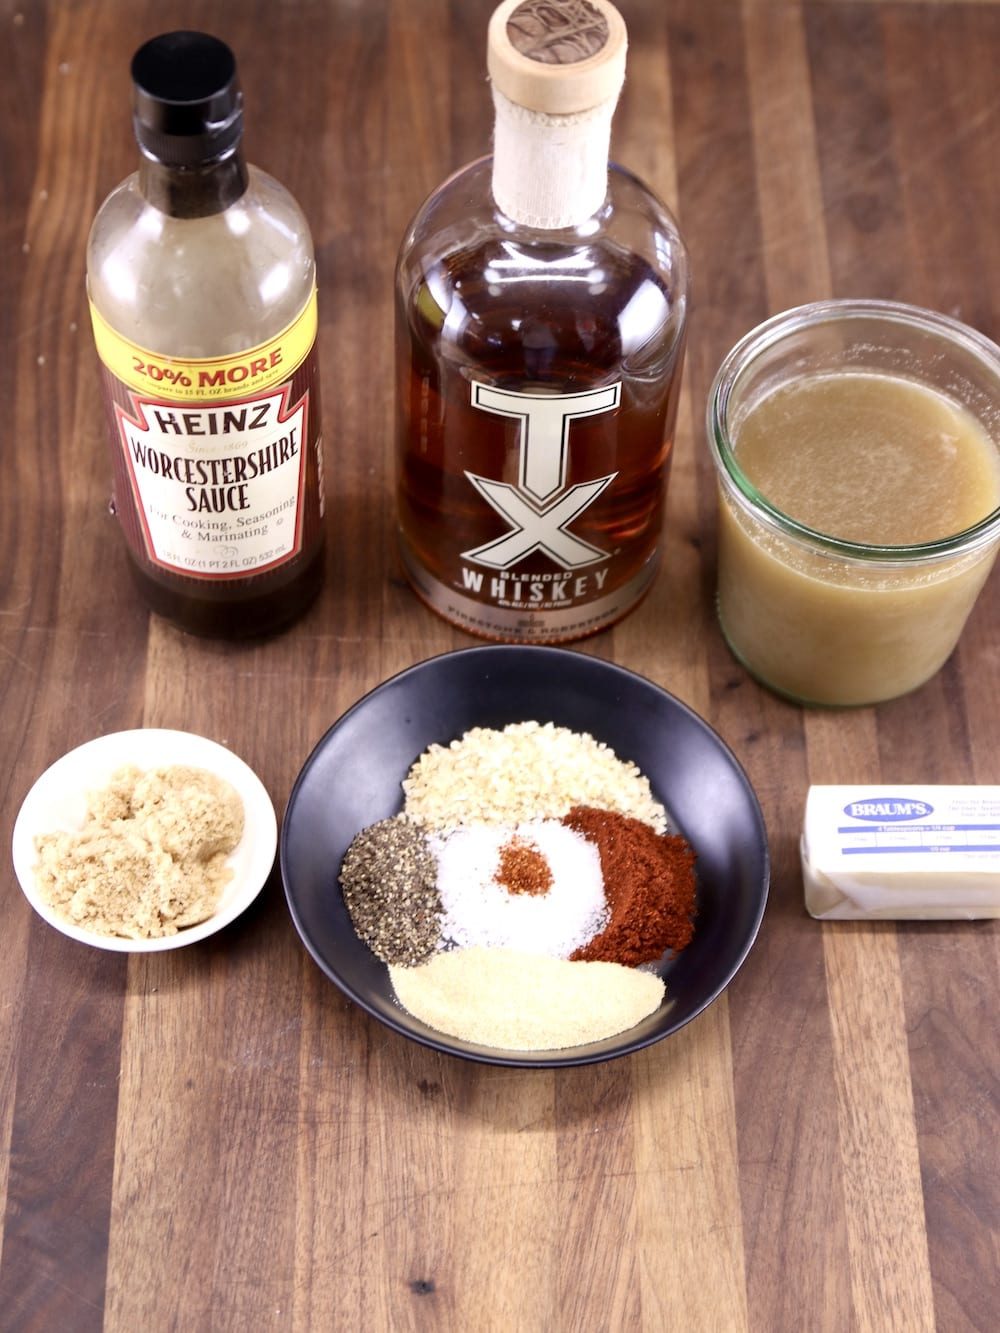 Ingredients for Whiskey Steak Sauce